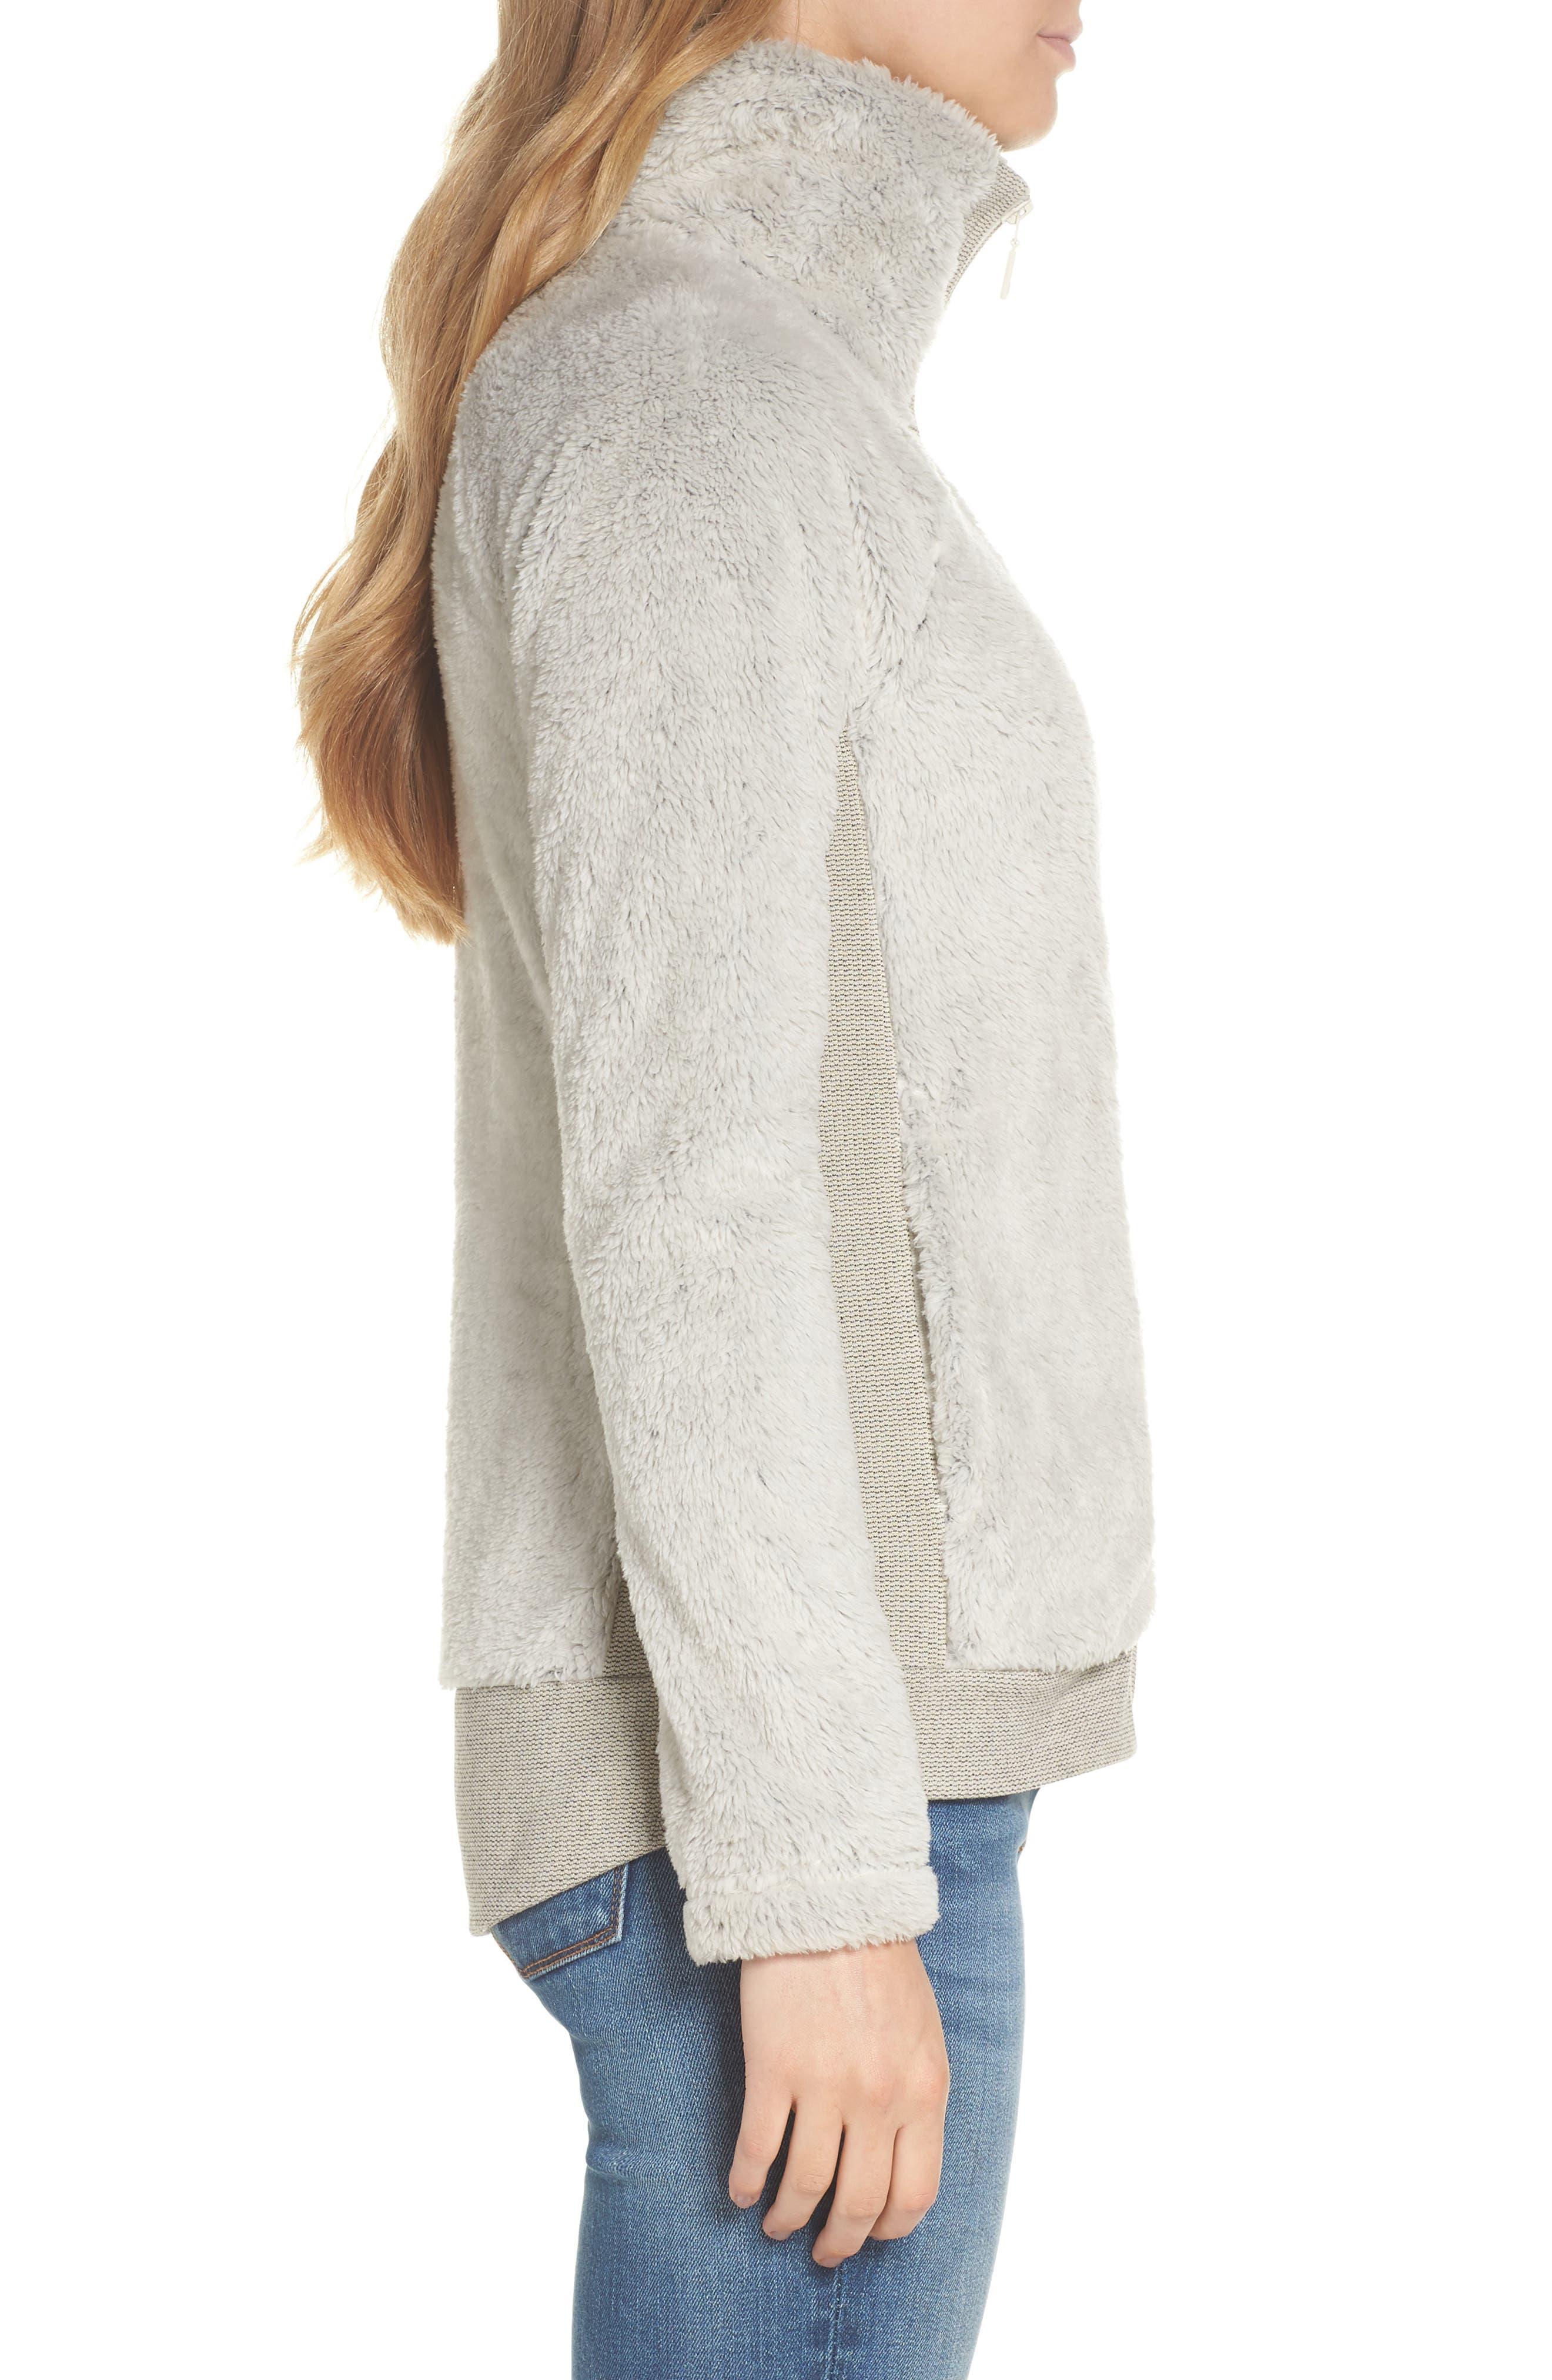 THE NORTH FACE, Furry Fleece Jacket, Alternate thumbnail 4, color, VINTAGE WHITE